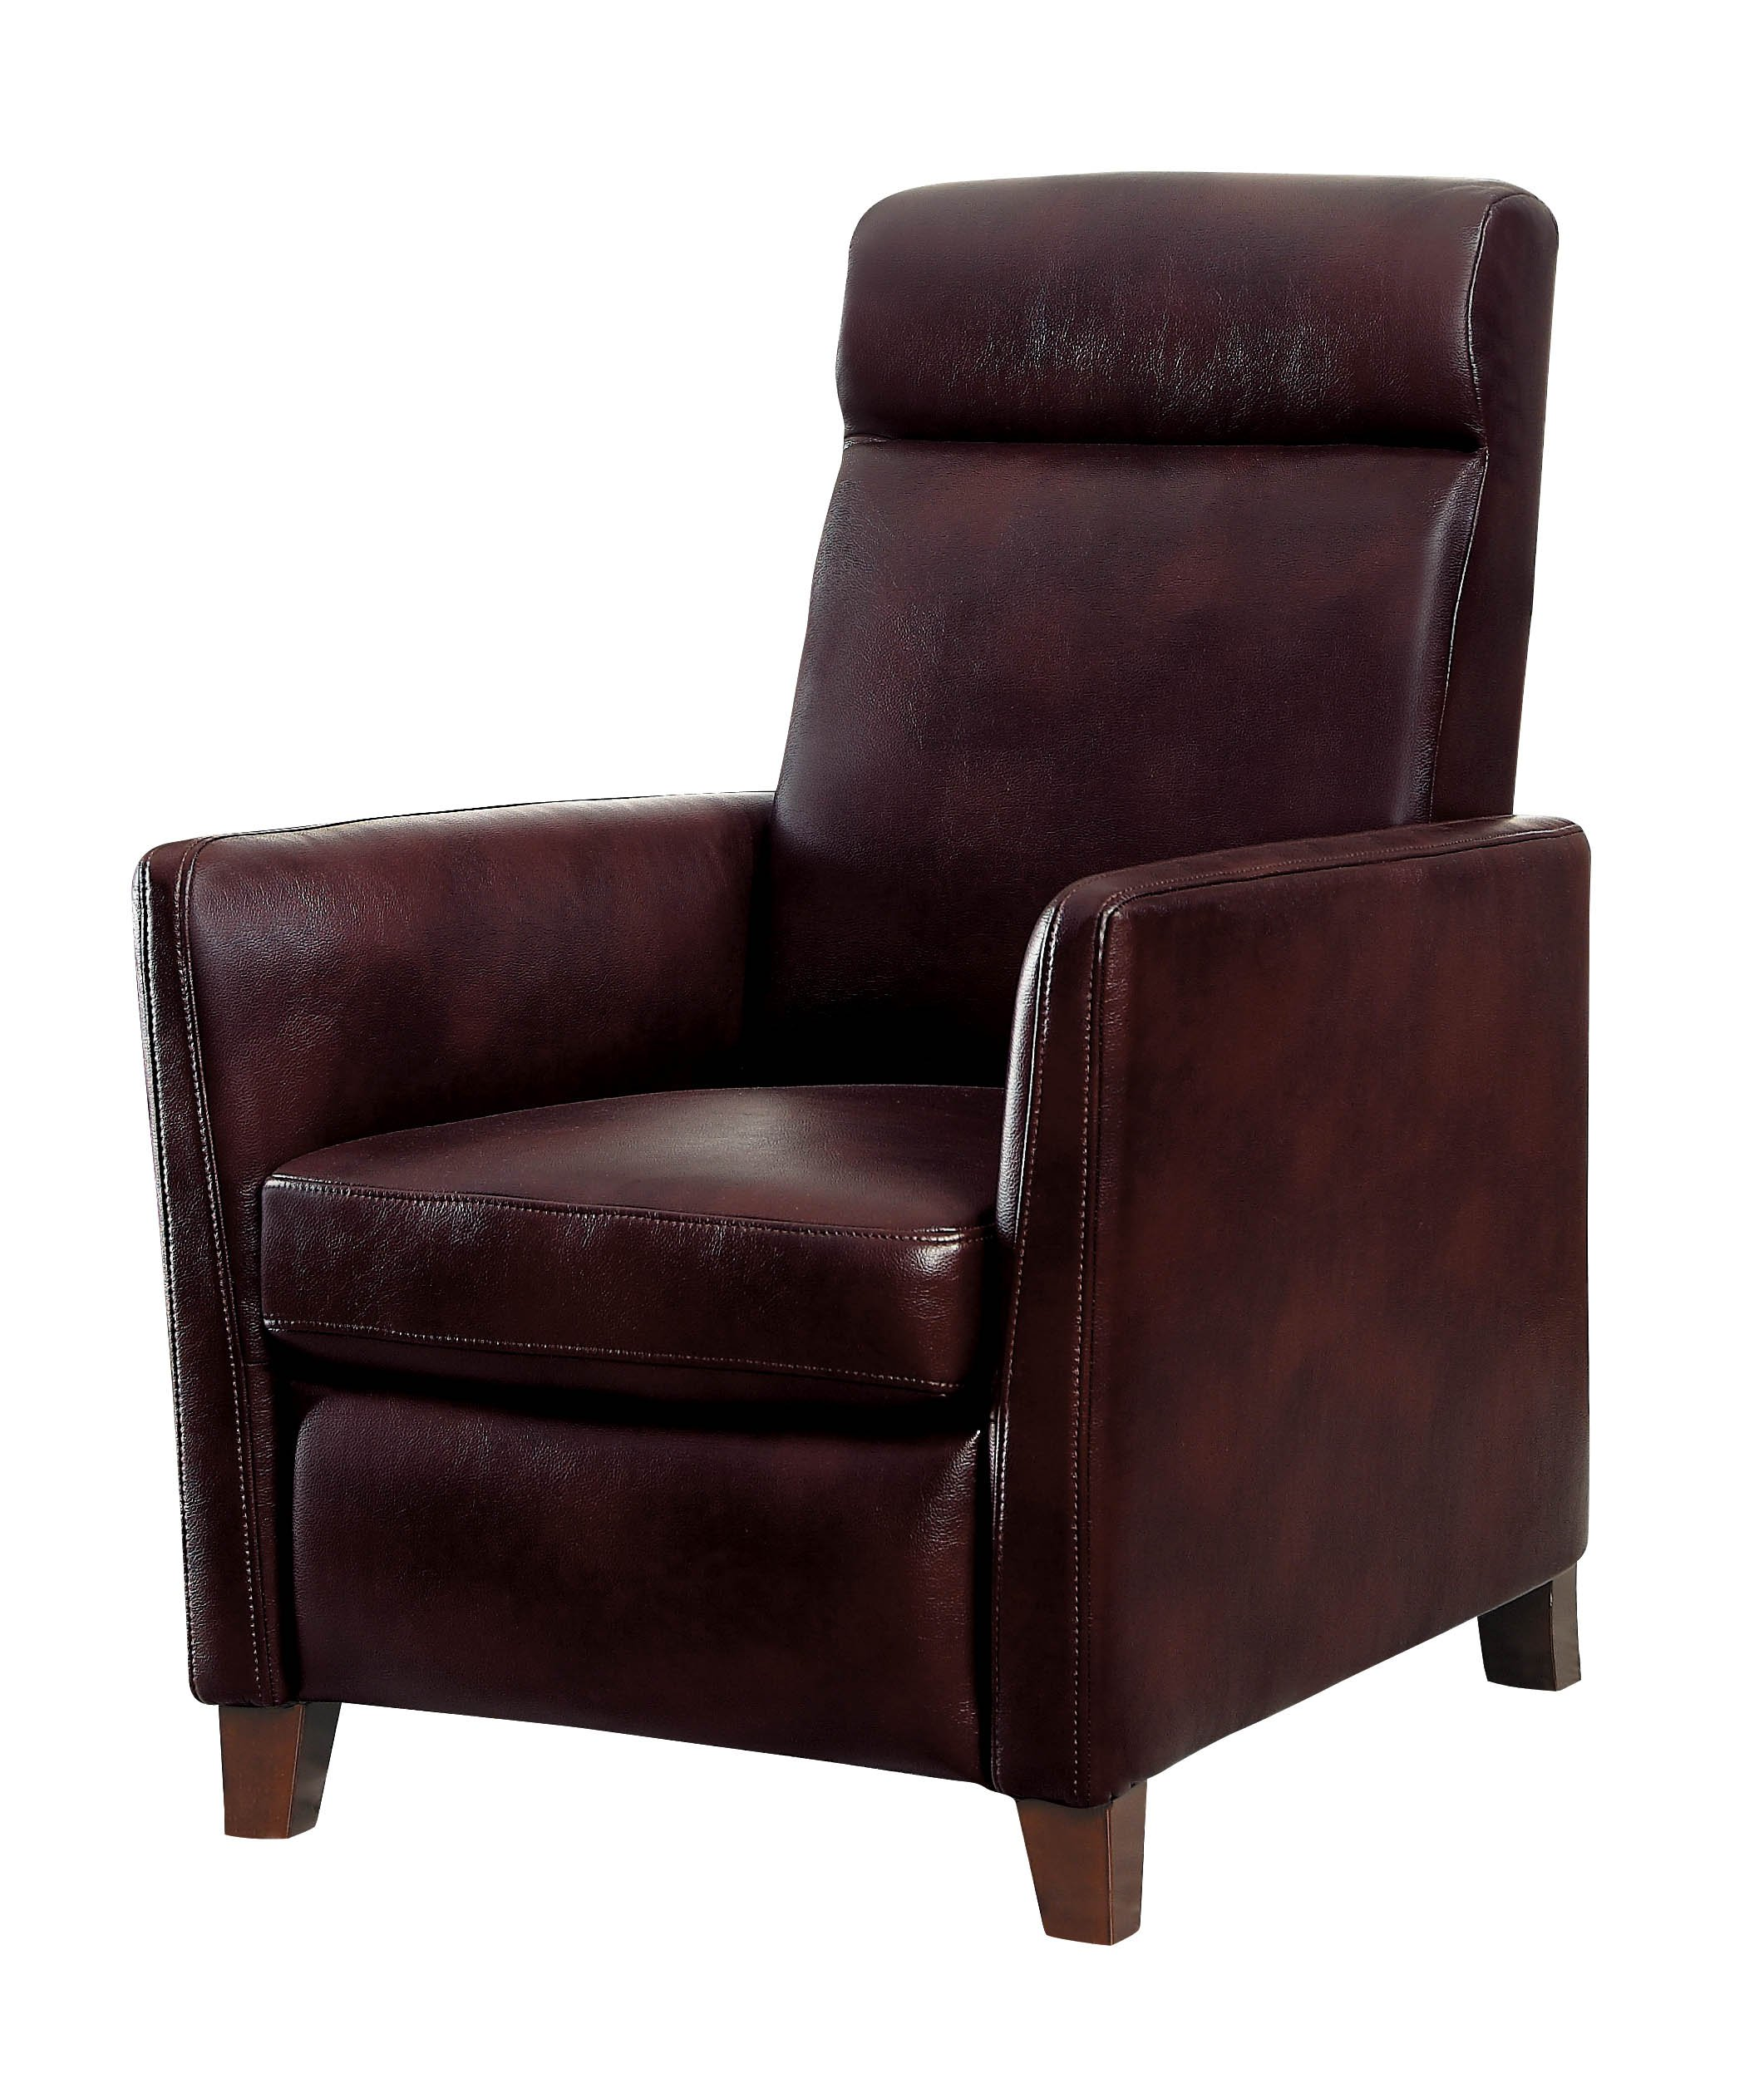 Homelegance Waneta Push Back Track Arm Reclining Club Chair Leather Gel Match, Brown